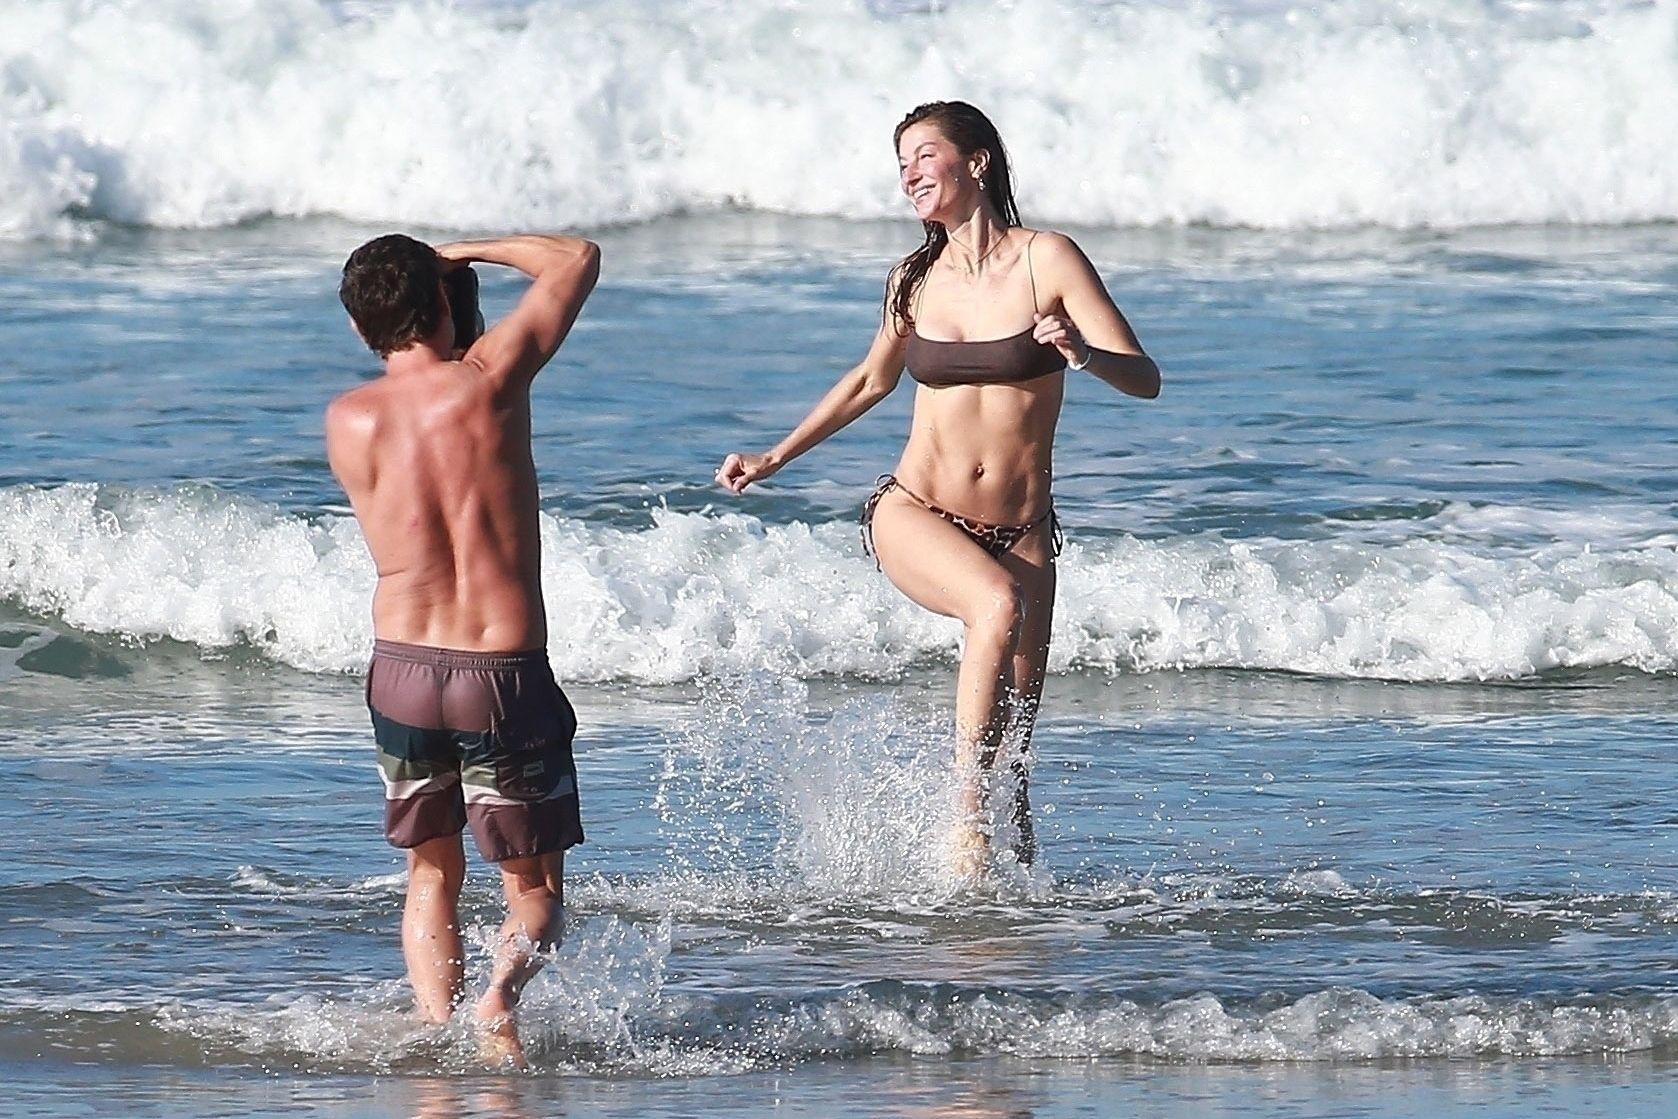 Gisele Bundchen Puts Her Incredible Bikini Body On Display During A Beach Photoshoot 0023